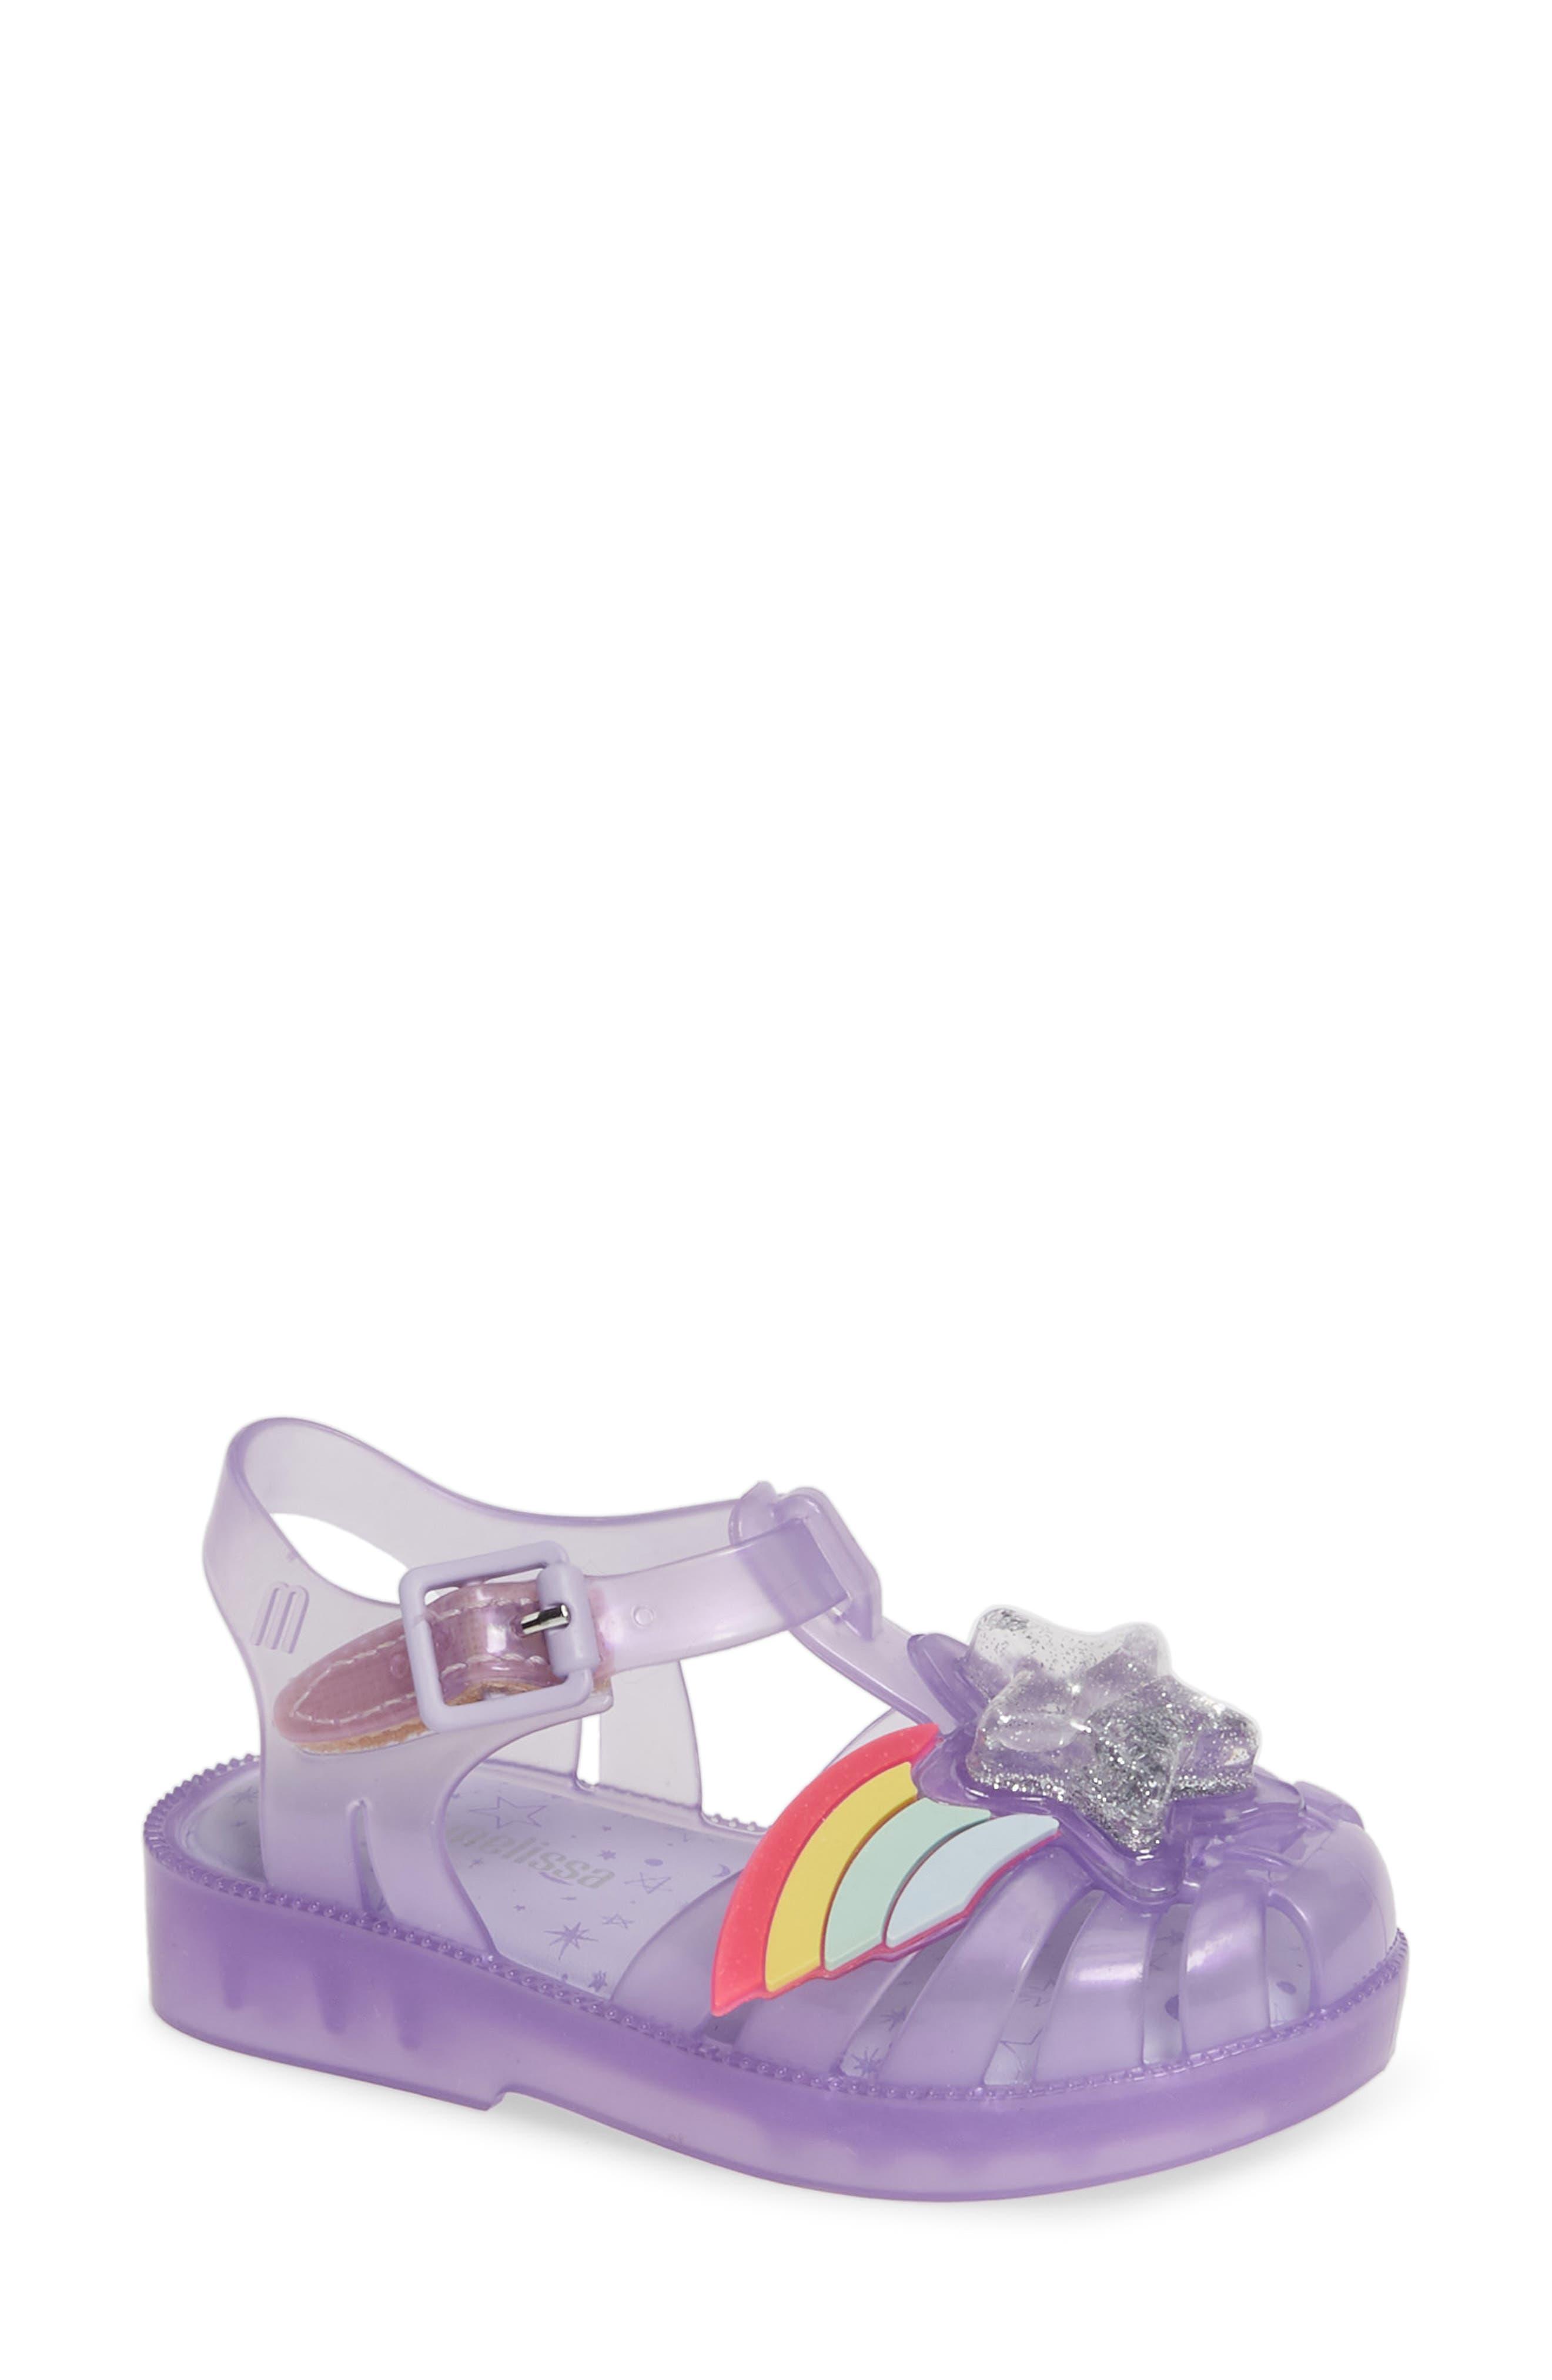 MINI MELISSA Possession II Glitter Sandal, Main, color, PURPLE